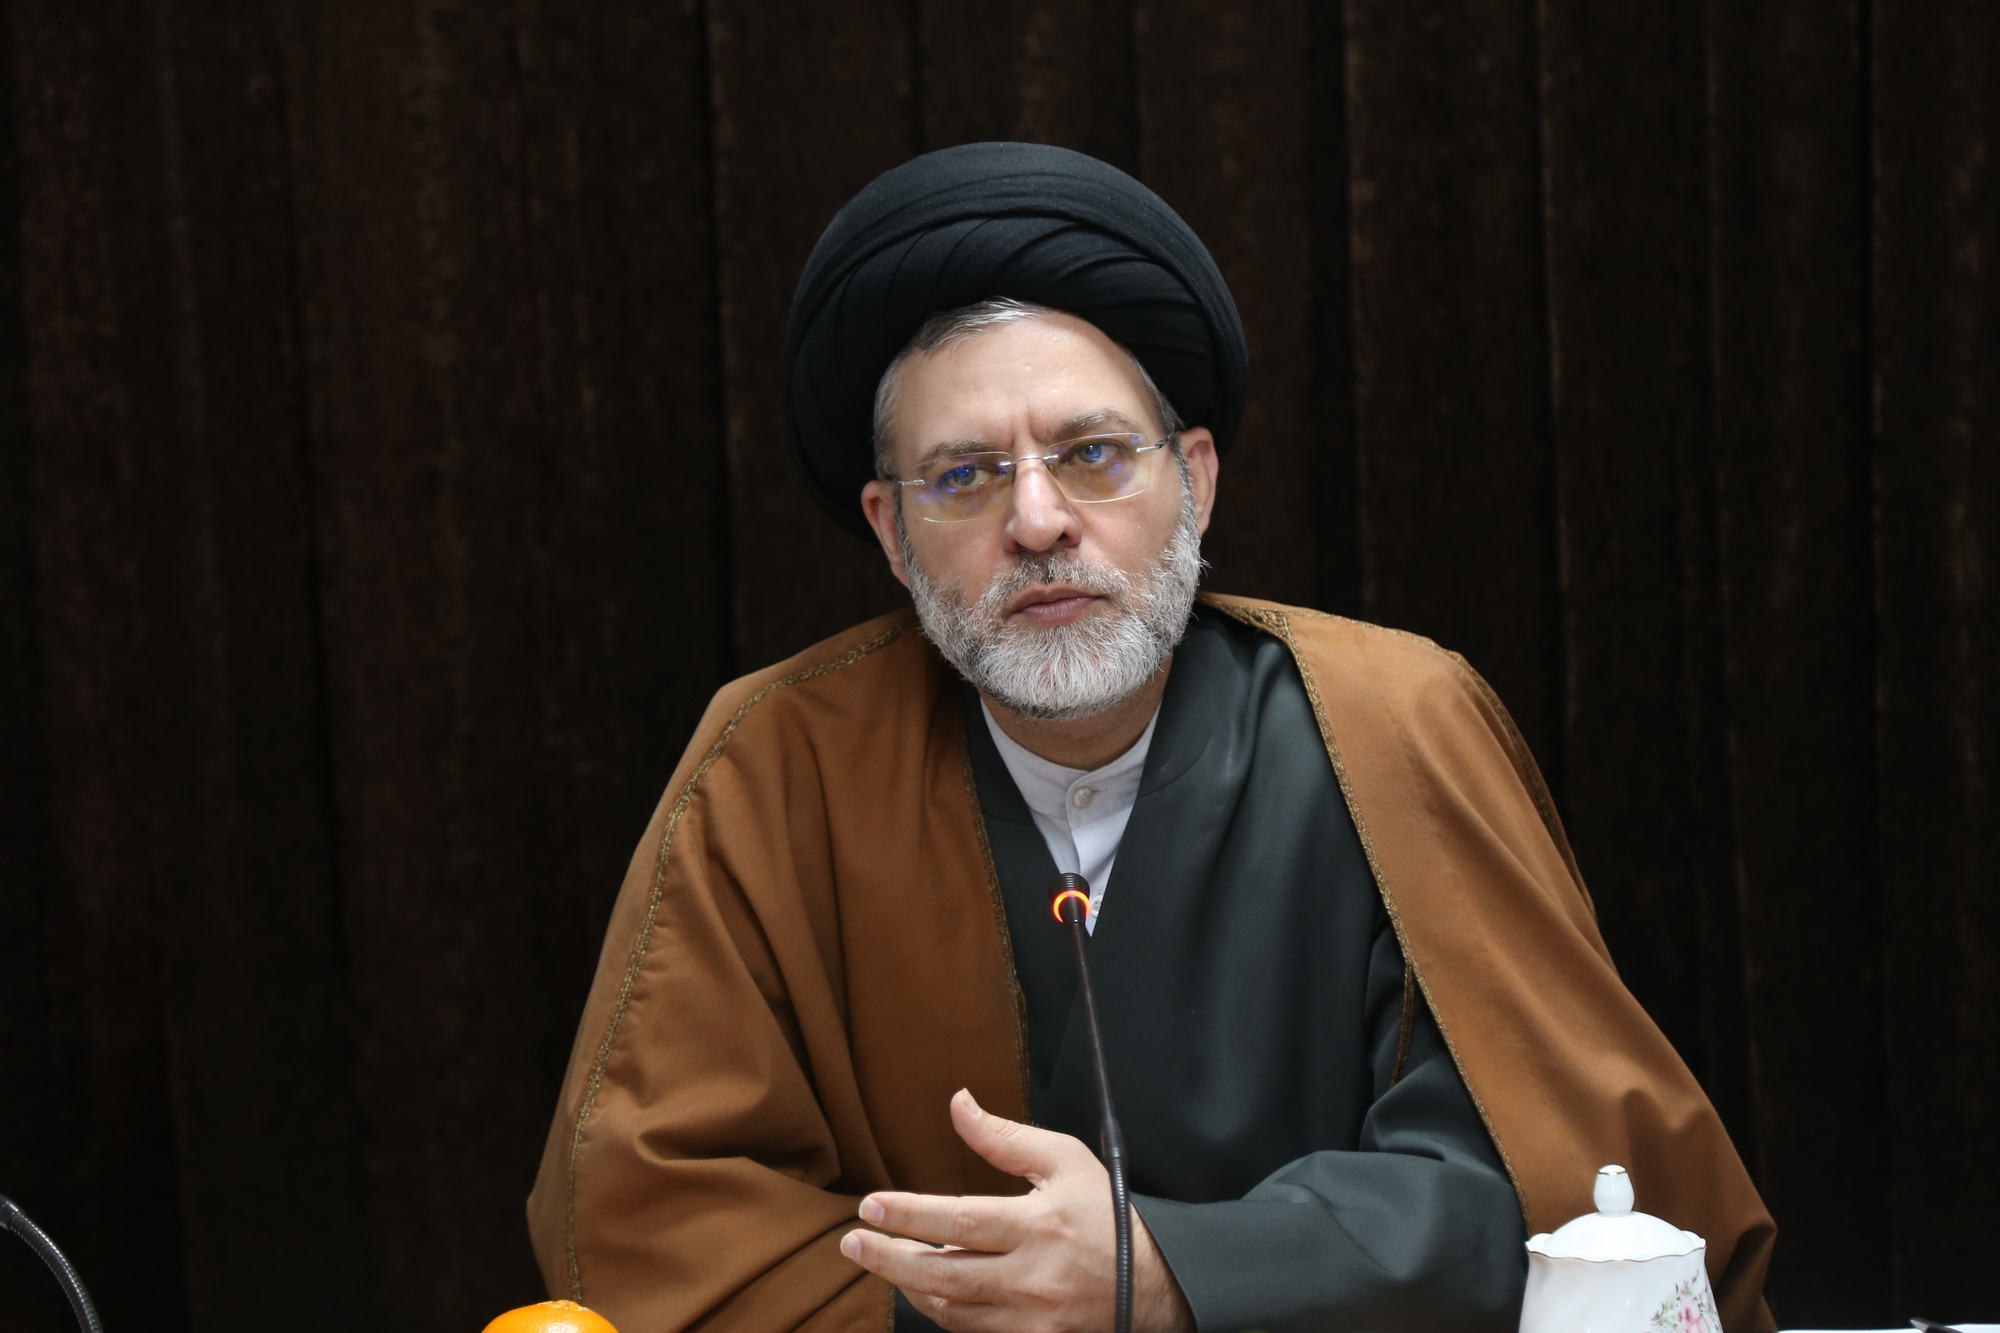 حجت الاسلام هاشمی معاون پژوهش سطح عالی حوزه